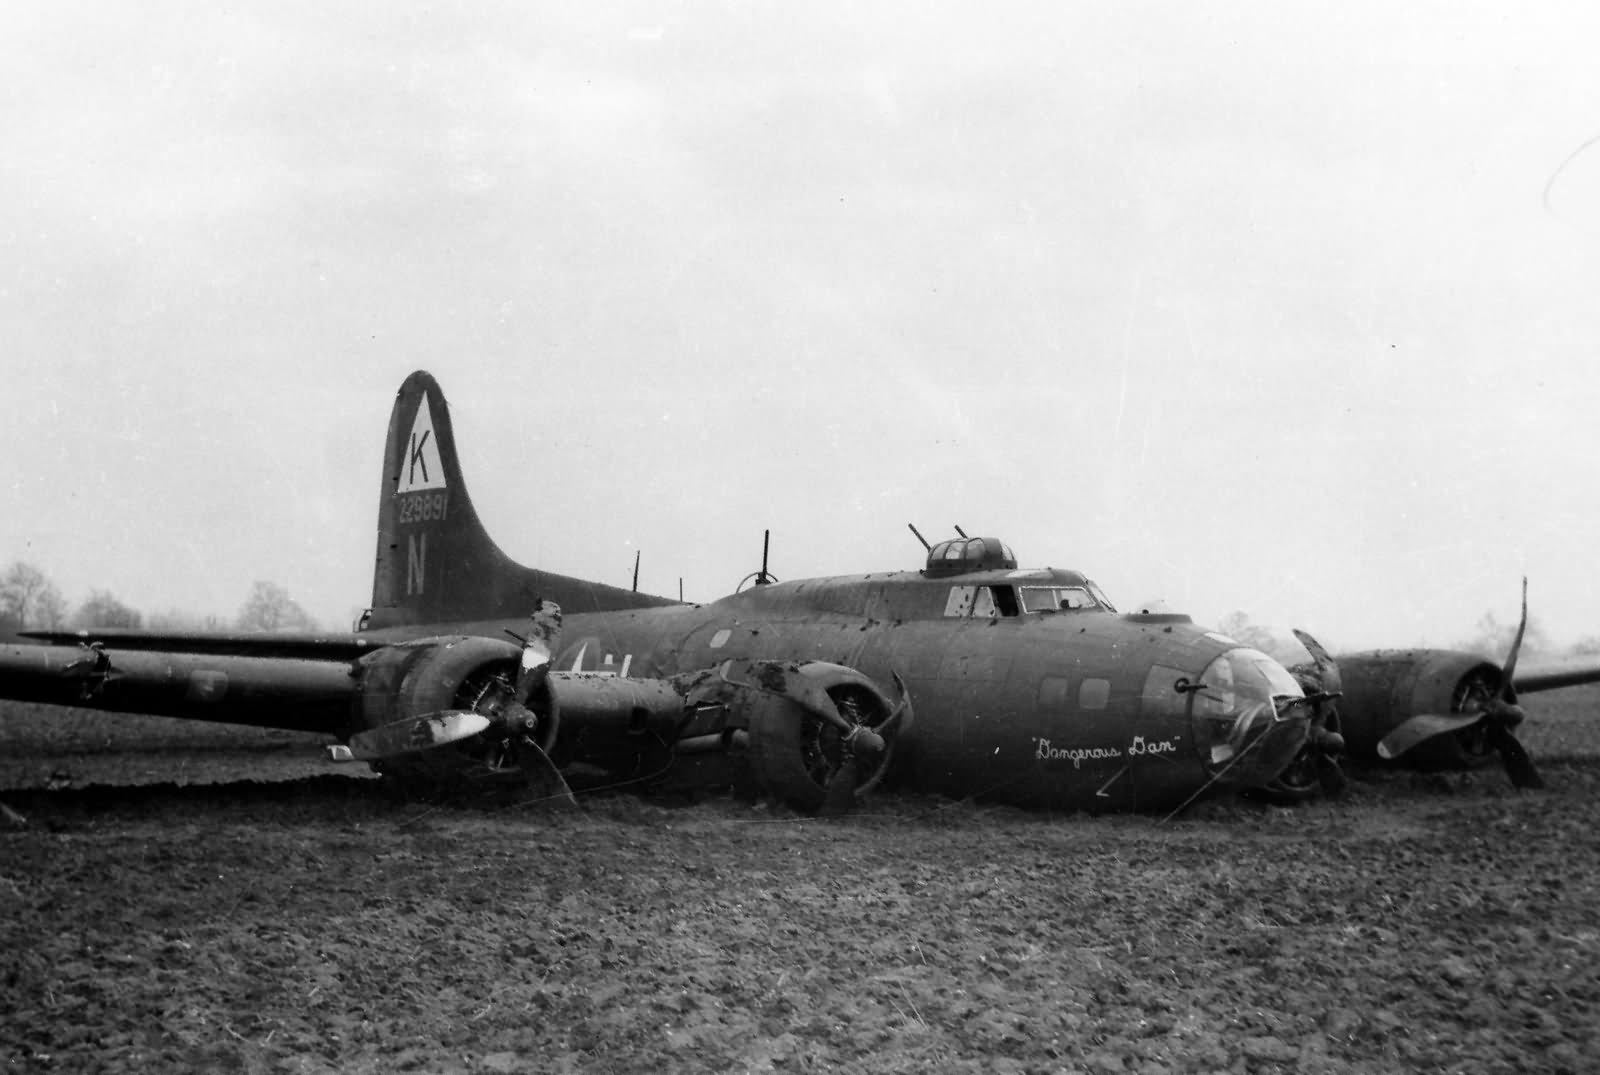 B-17 #42-29891 / Dangerous Dan